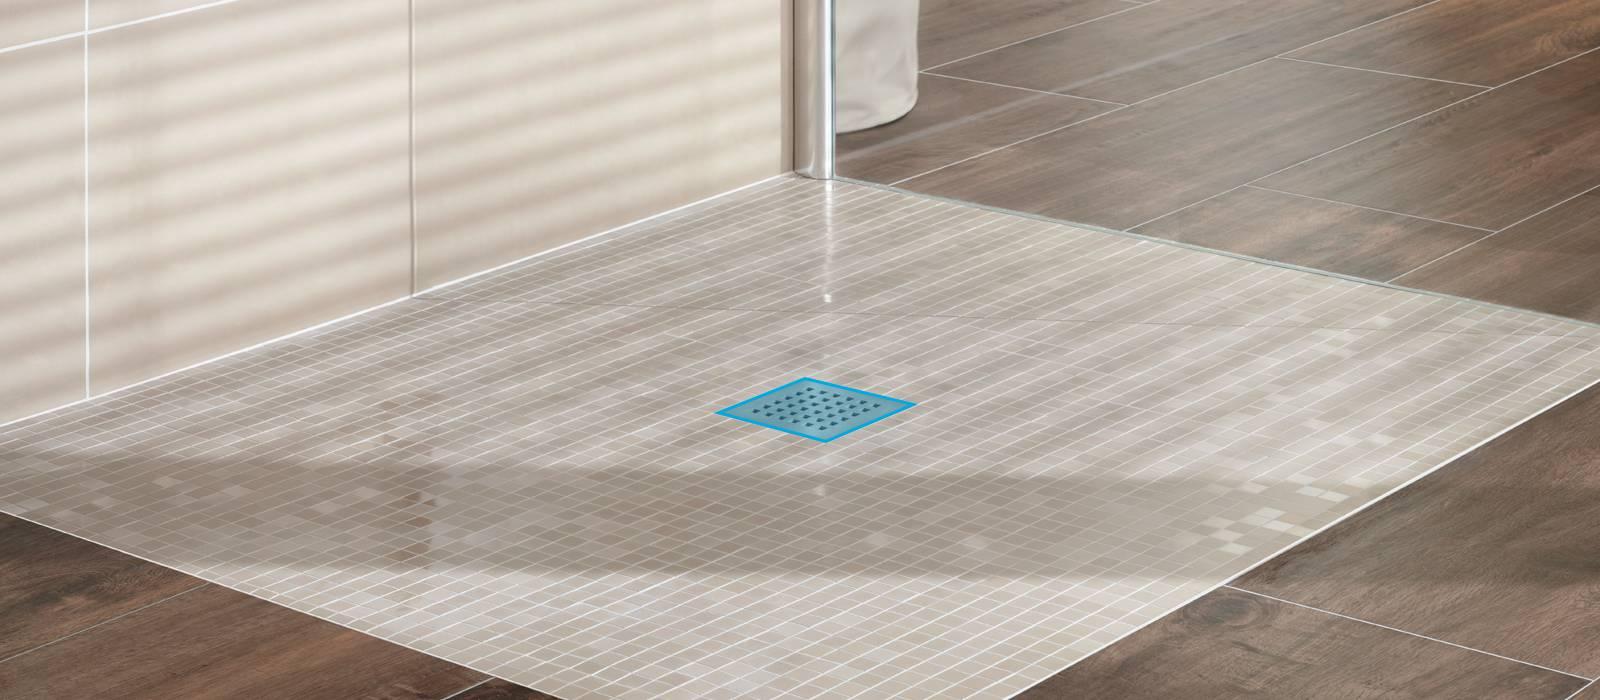 Vertical drain standard (point drainage)